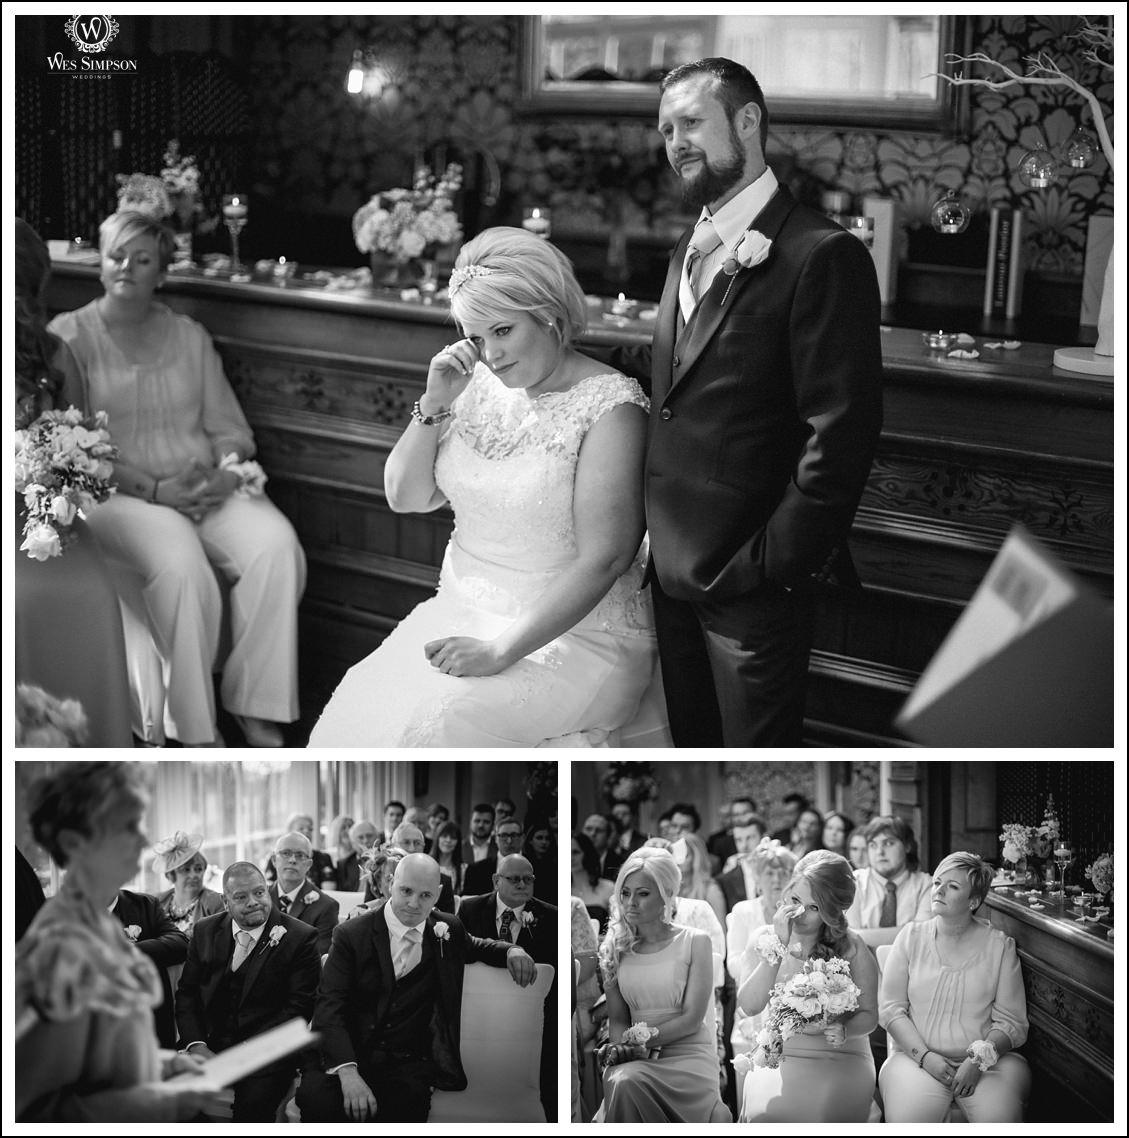 Broadoaks wedding venue, Lake District wedding photographer, Windermere, Wes Simpson photography_0034